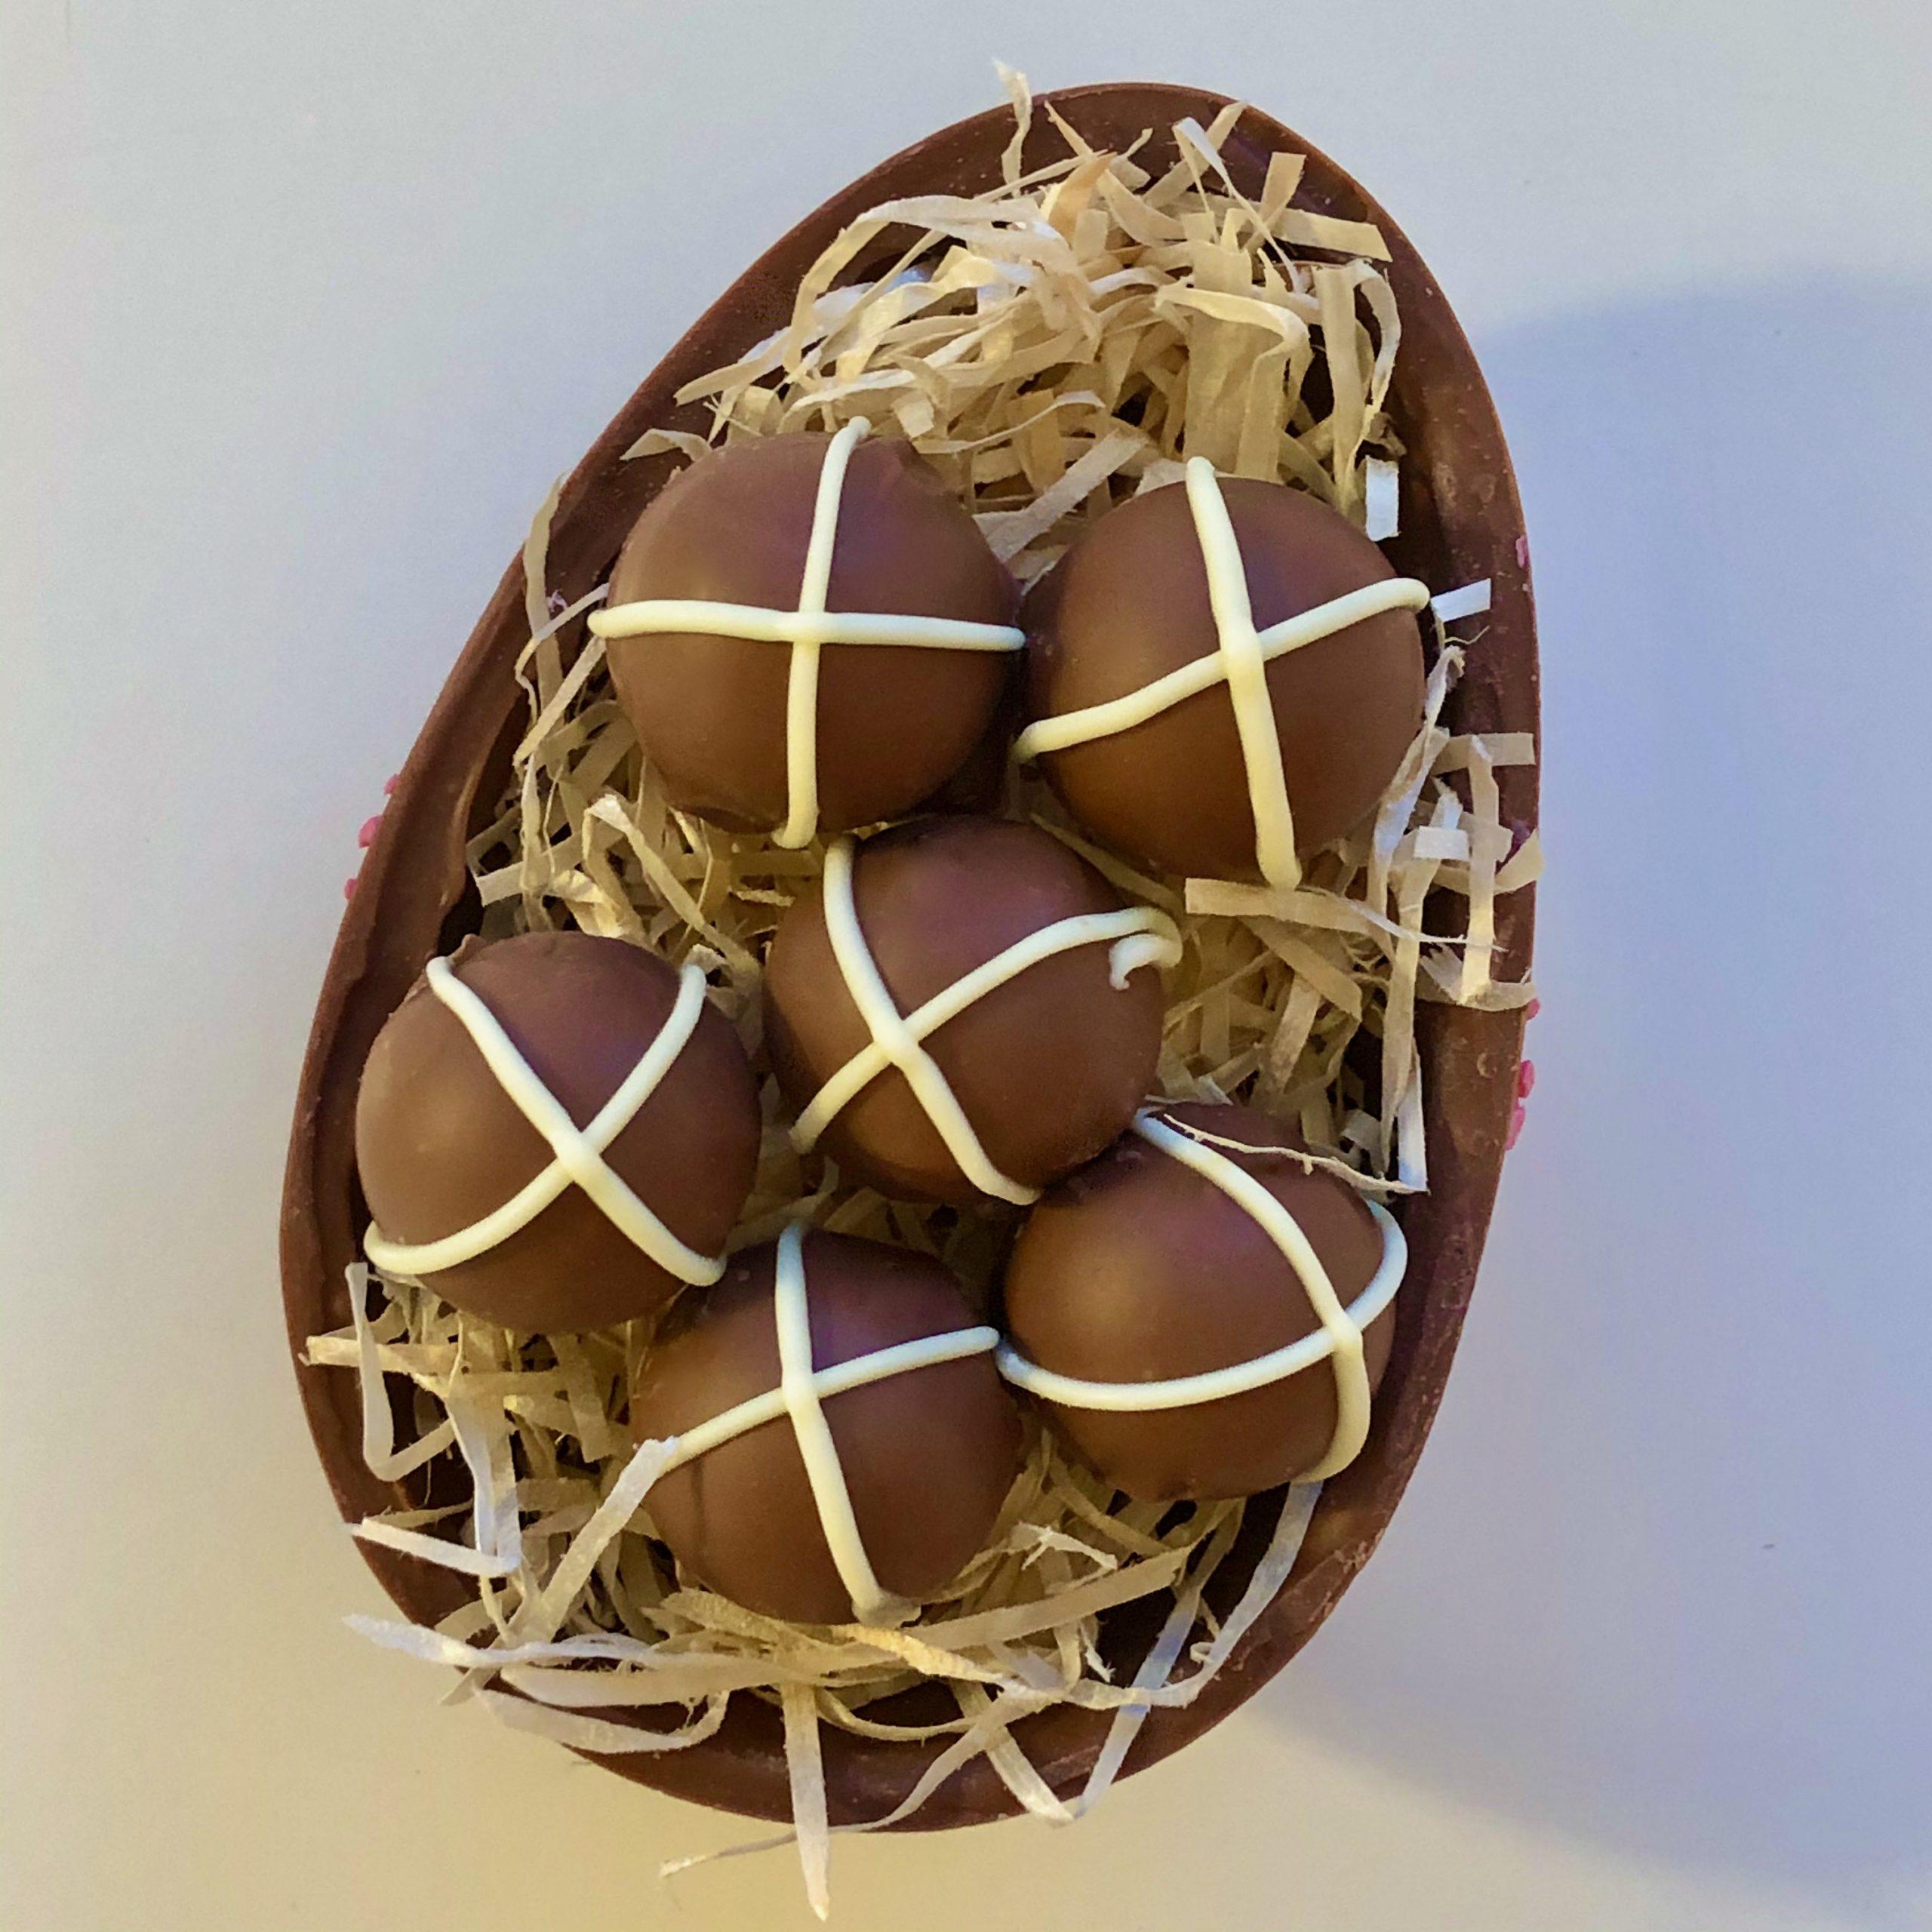 Rustic Hot Cross Bun Chocolate Truffles   Chocolate